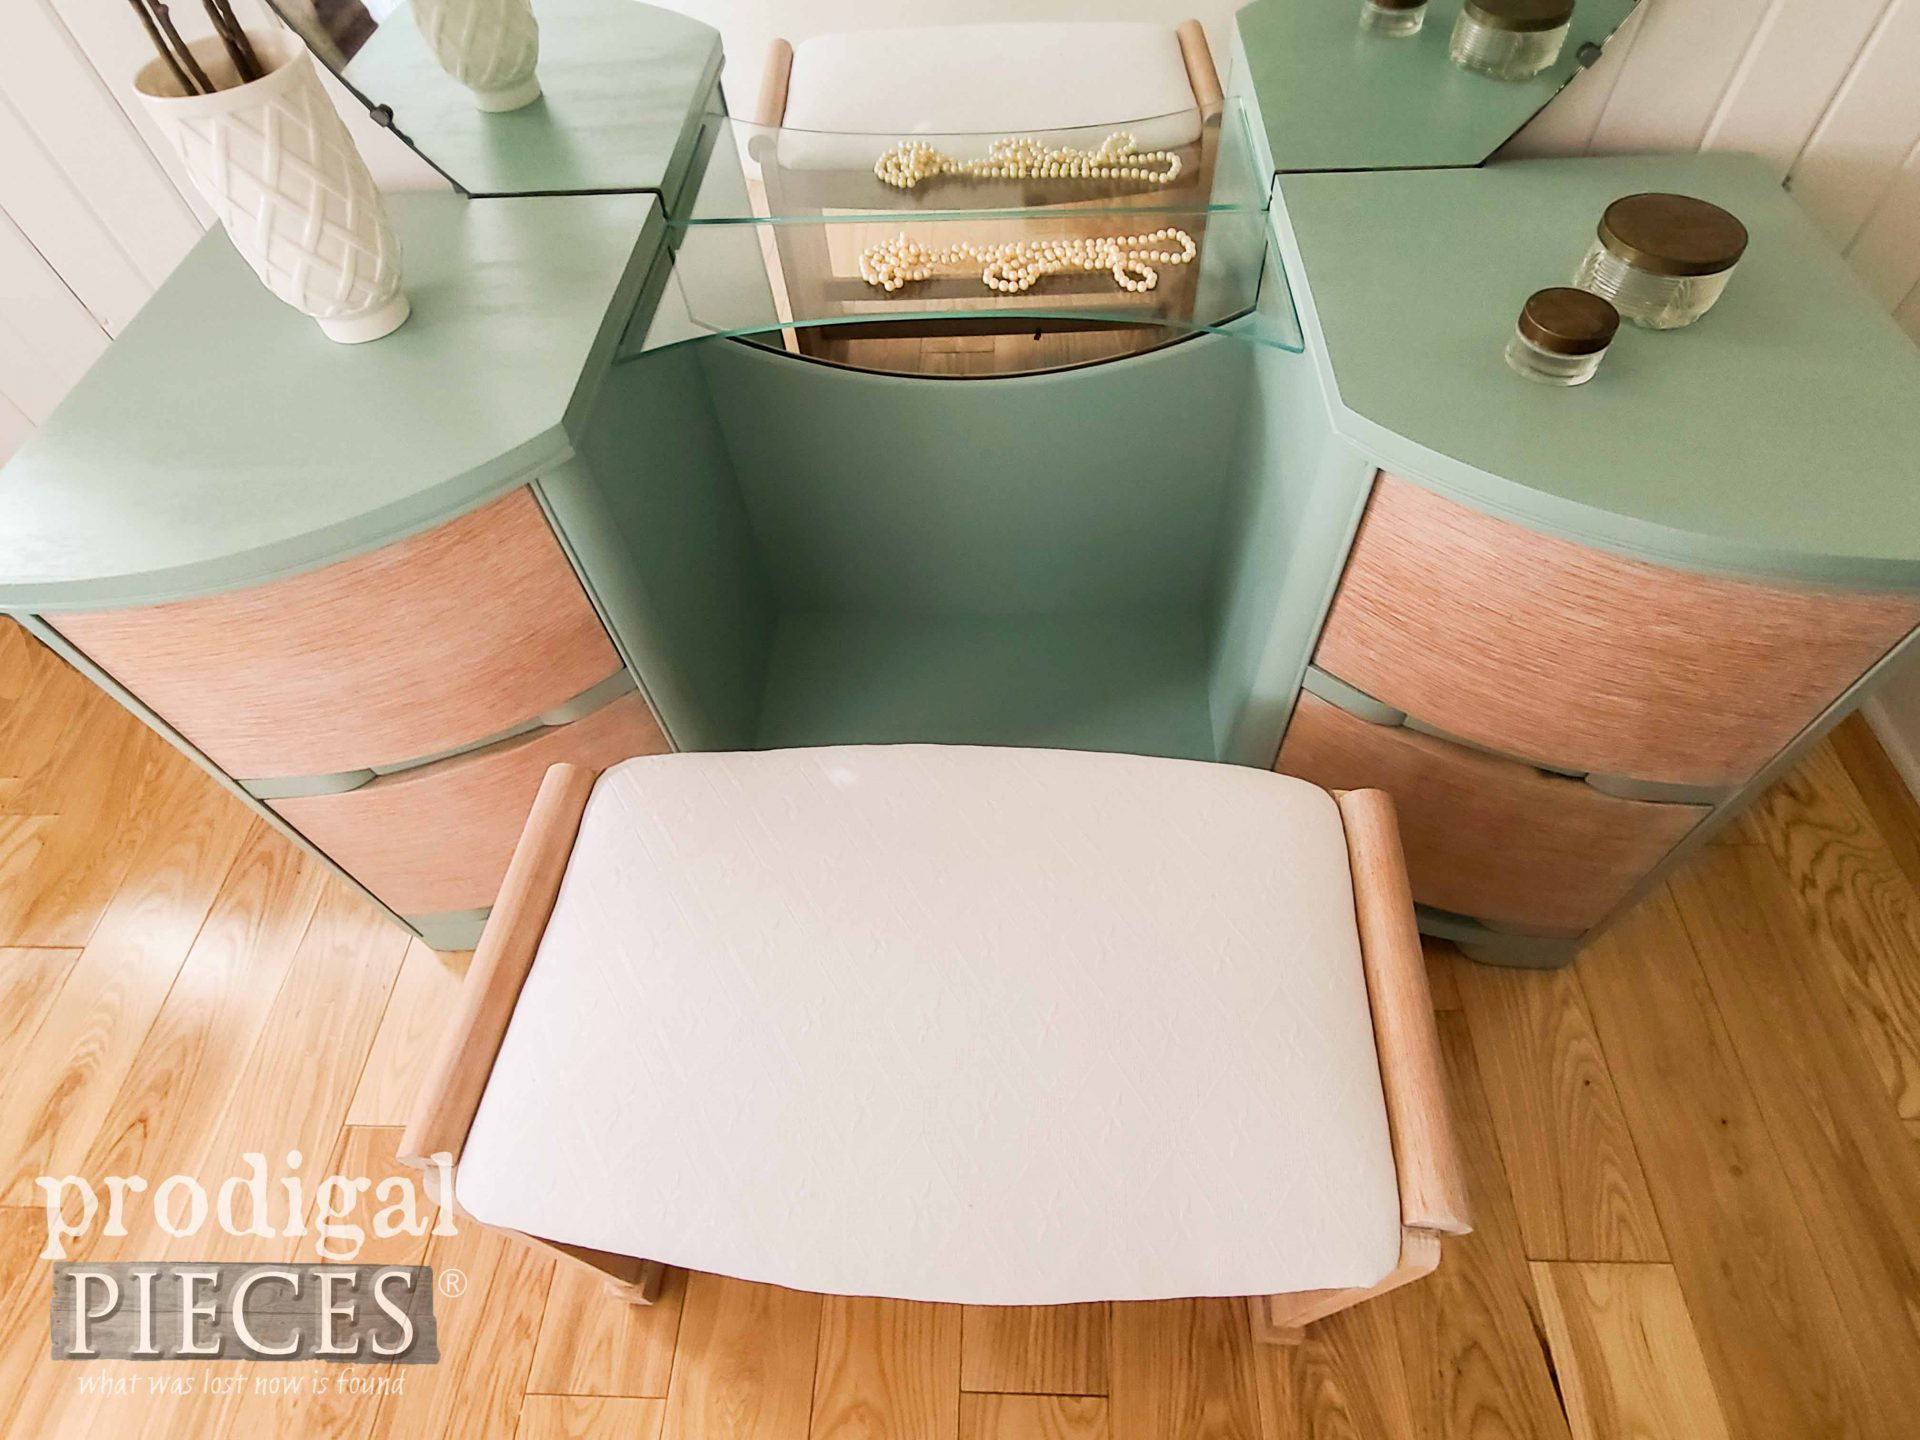 Vintage Art Deco Dressing Table Top by Larissa of Prodigal Pieces | prodigalpieces.com #prodigalpieces #furniture #home #diy #artdeco #boho